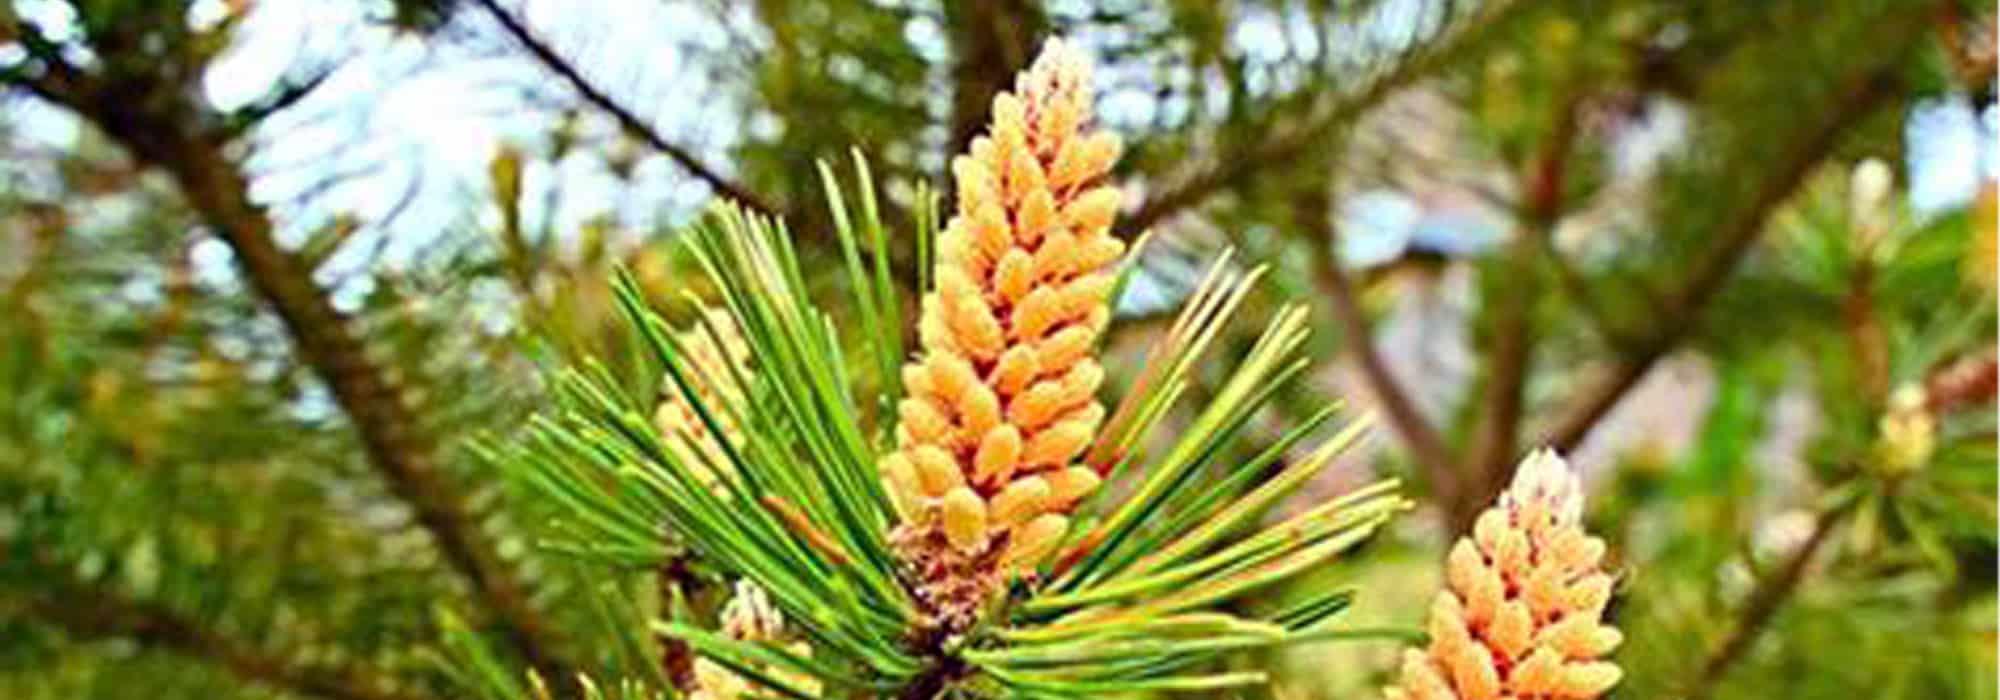 pine pollen megadose, Pine Pollen Powder